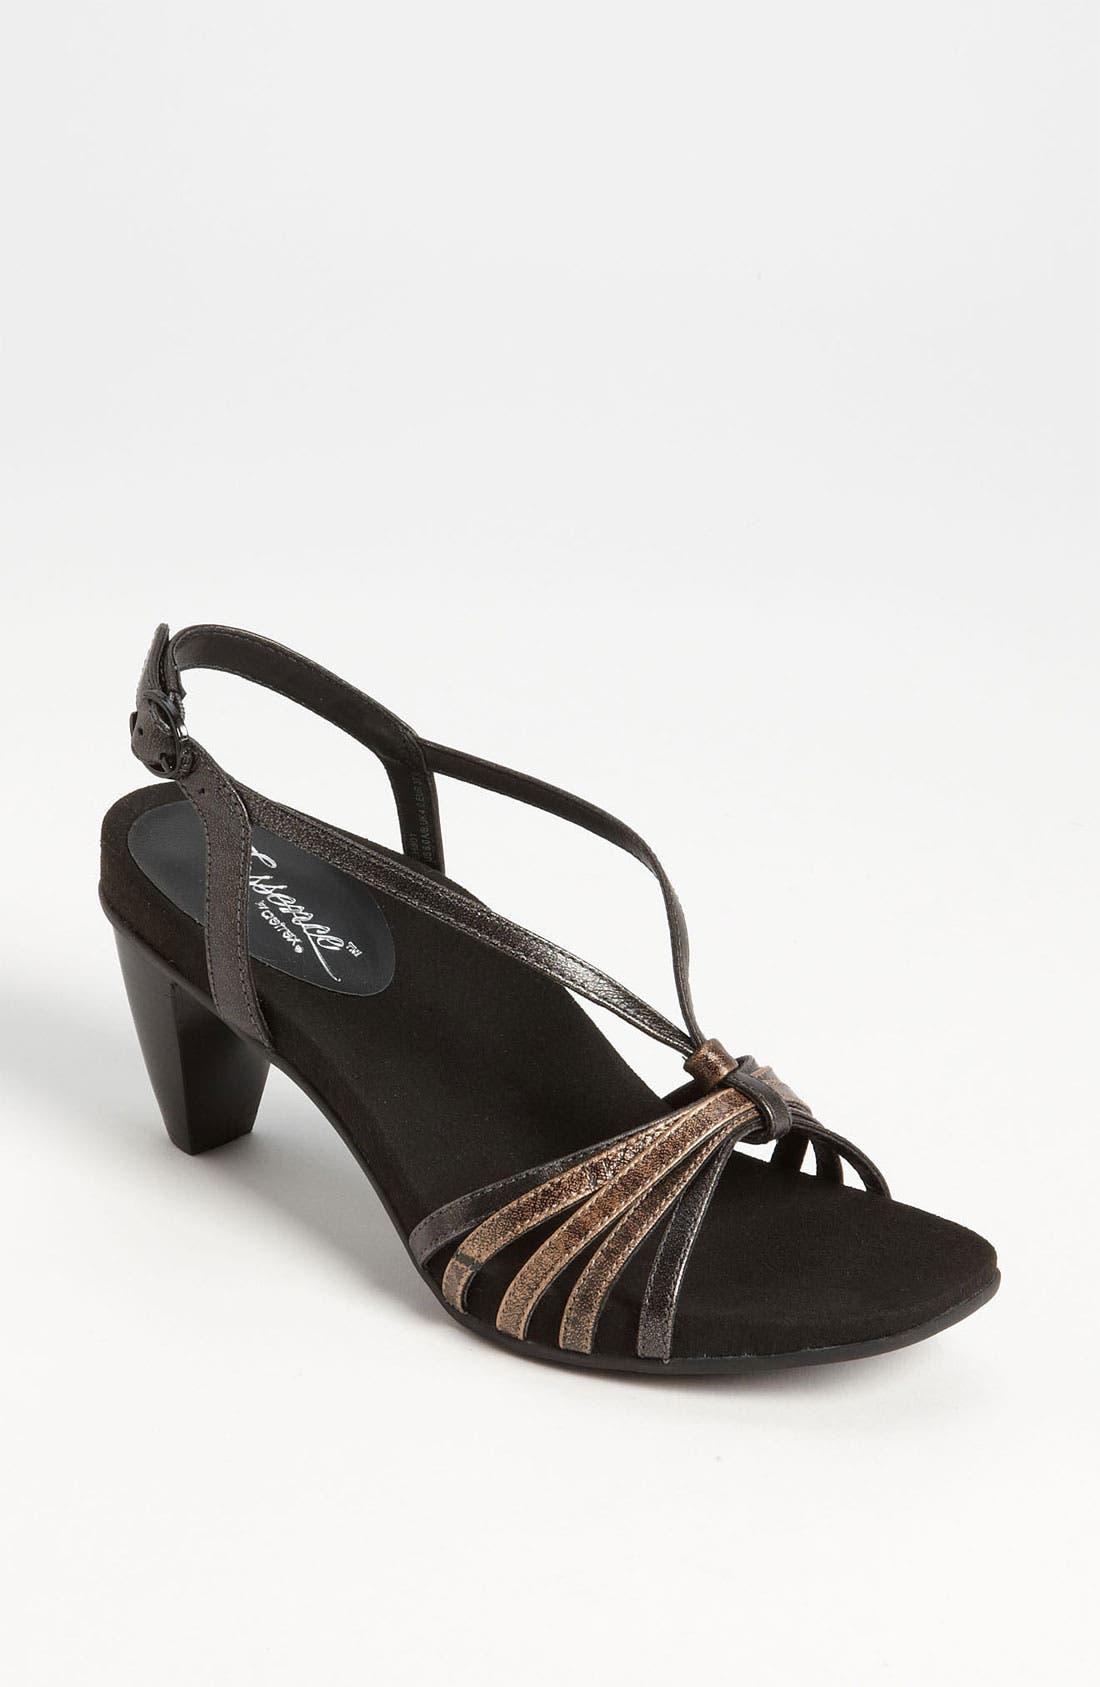 Alternate Image 1 Selected - Aetrex 'Angelina' Sandal